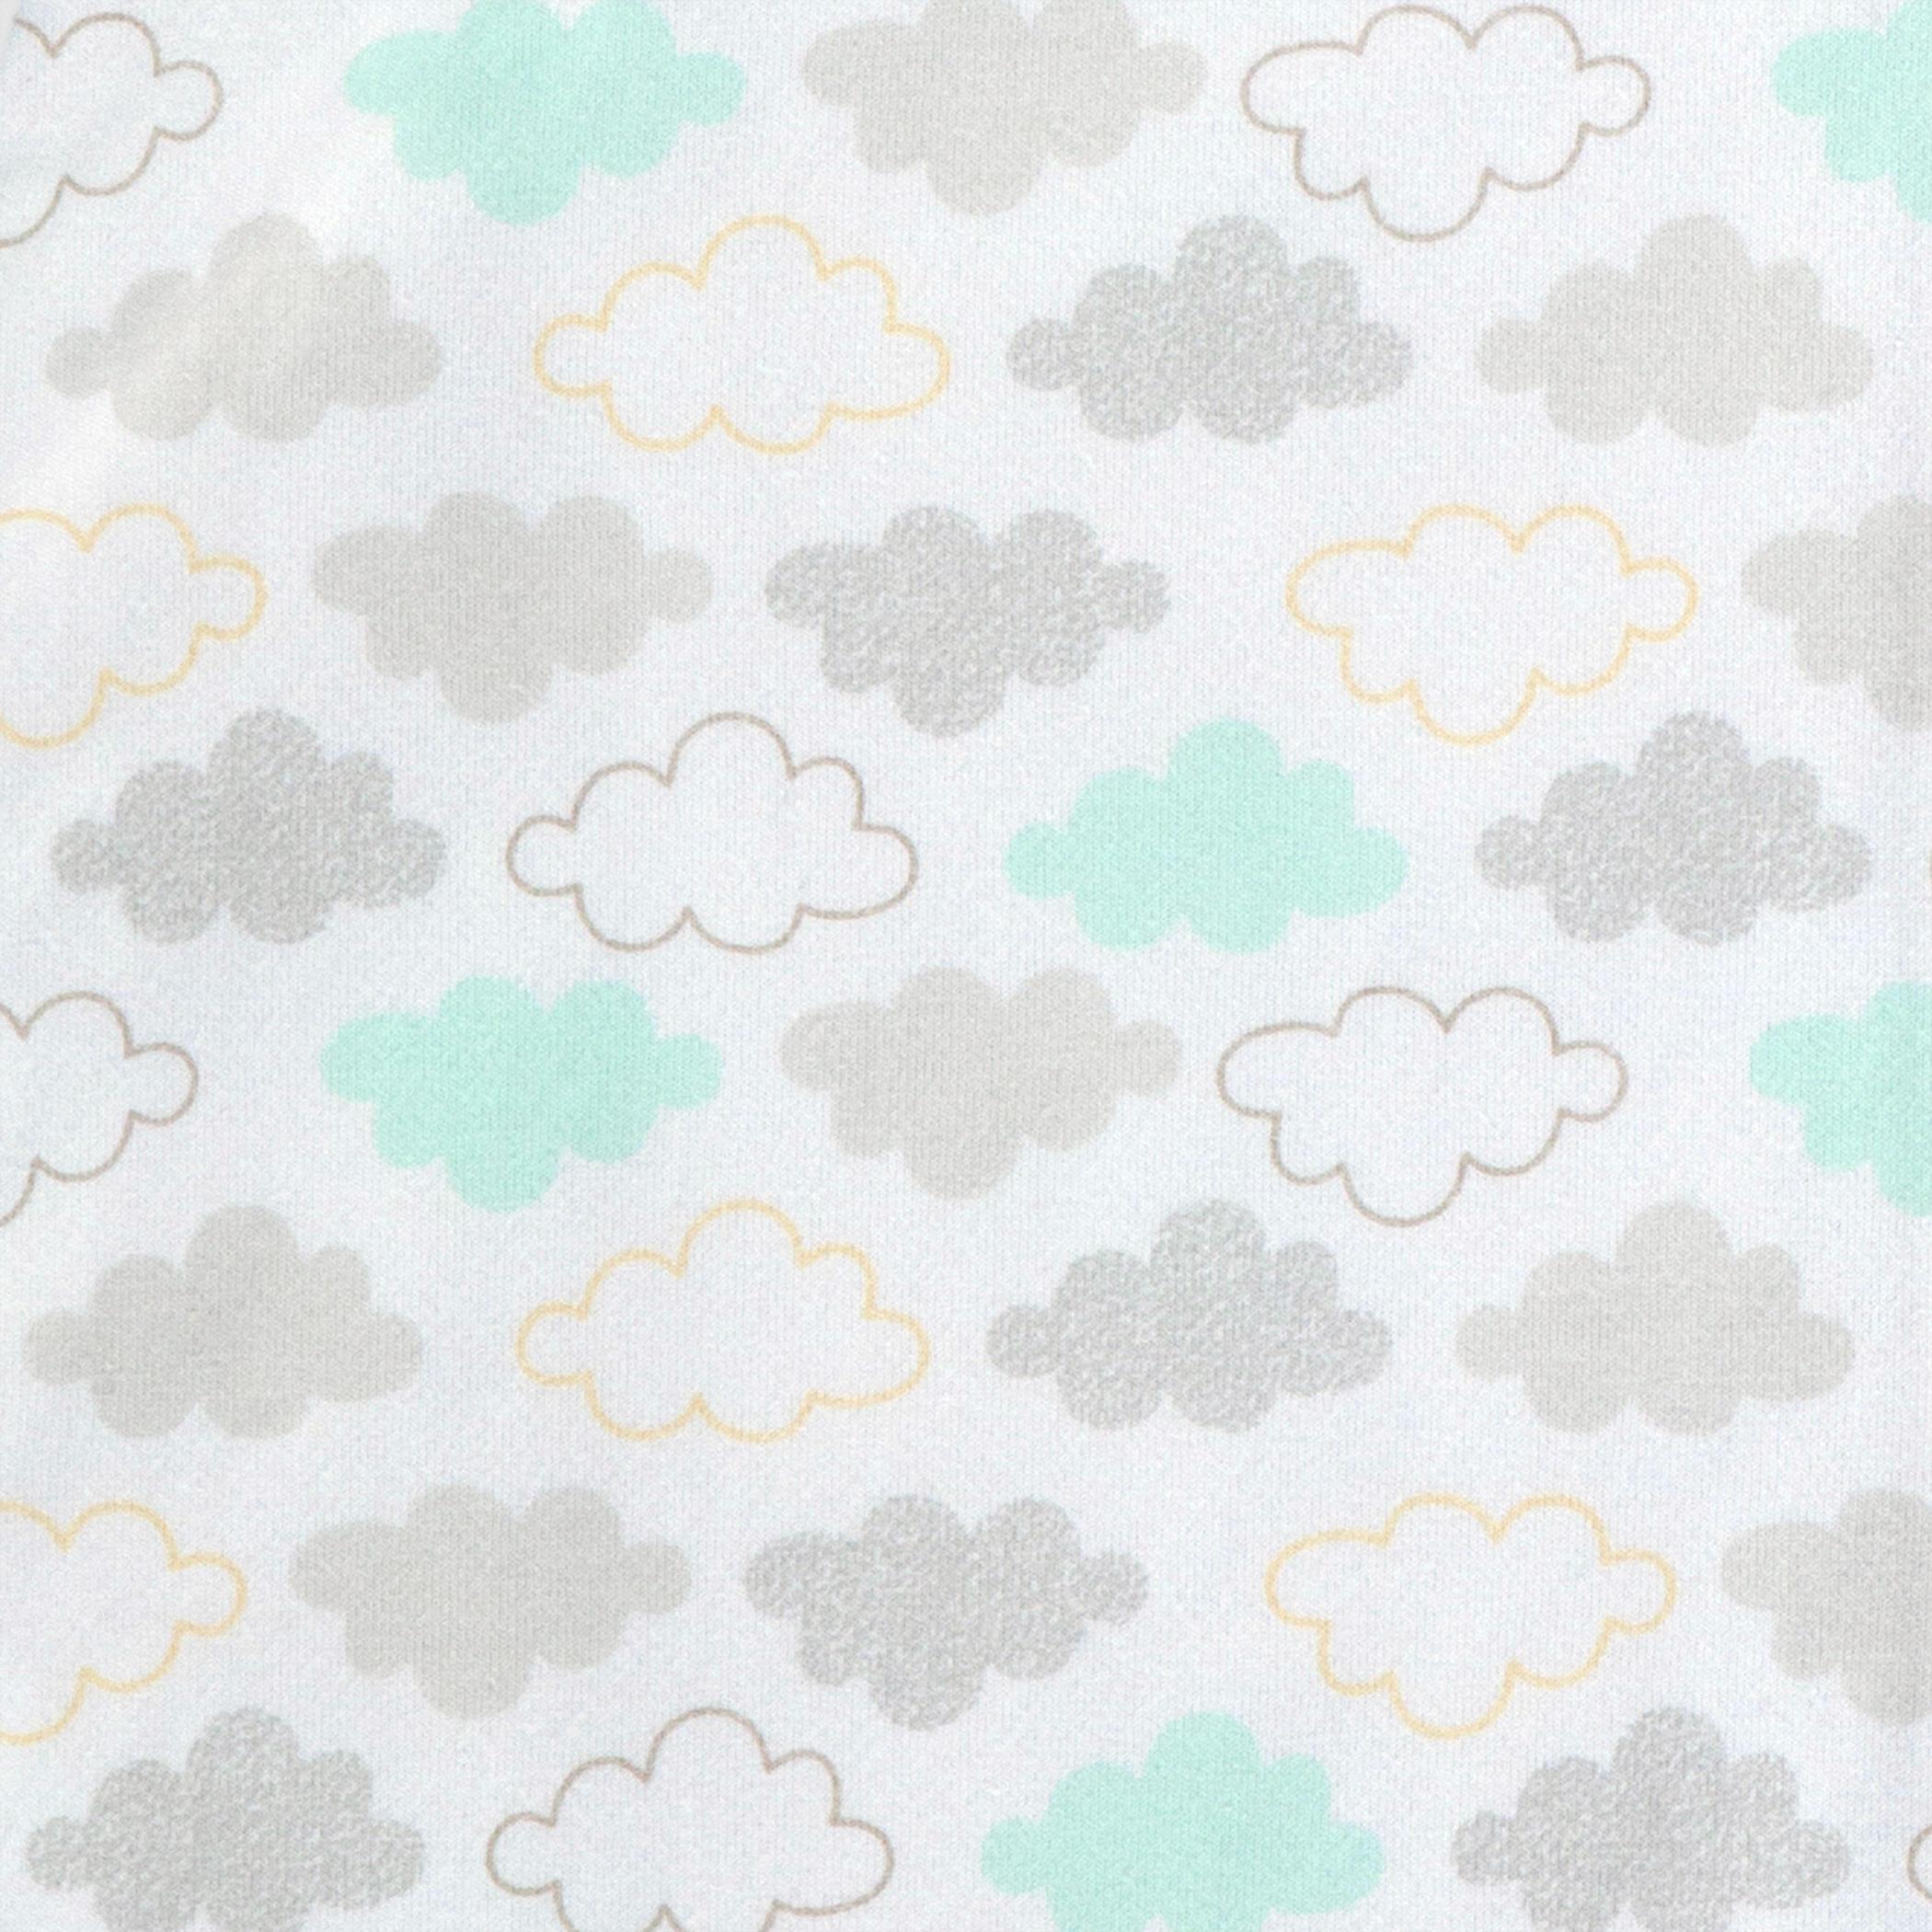 Peanut Sleeping Bag™ - Cozy Clouds™ - Large